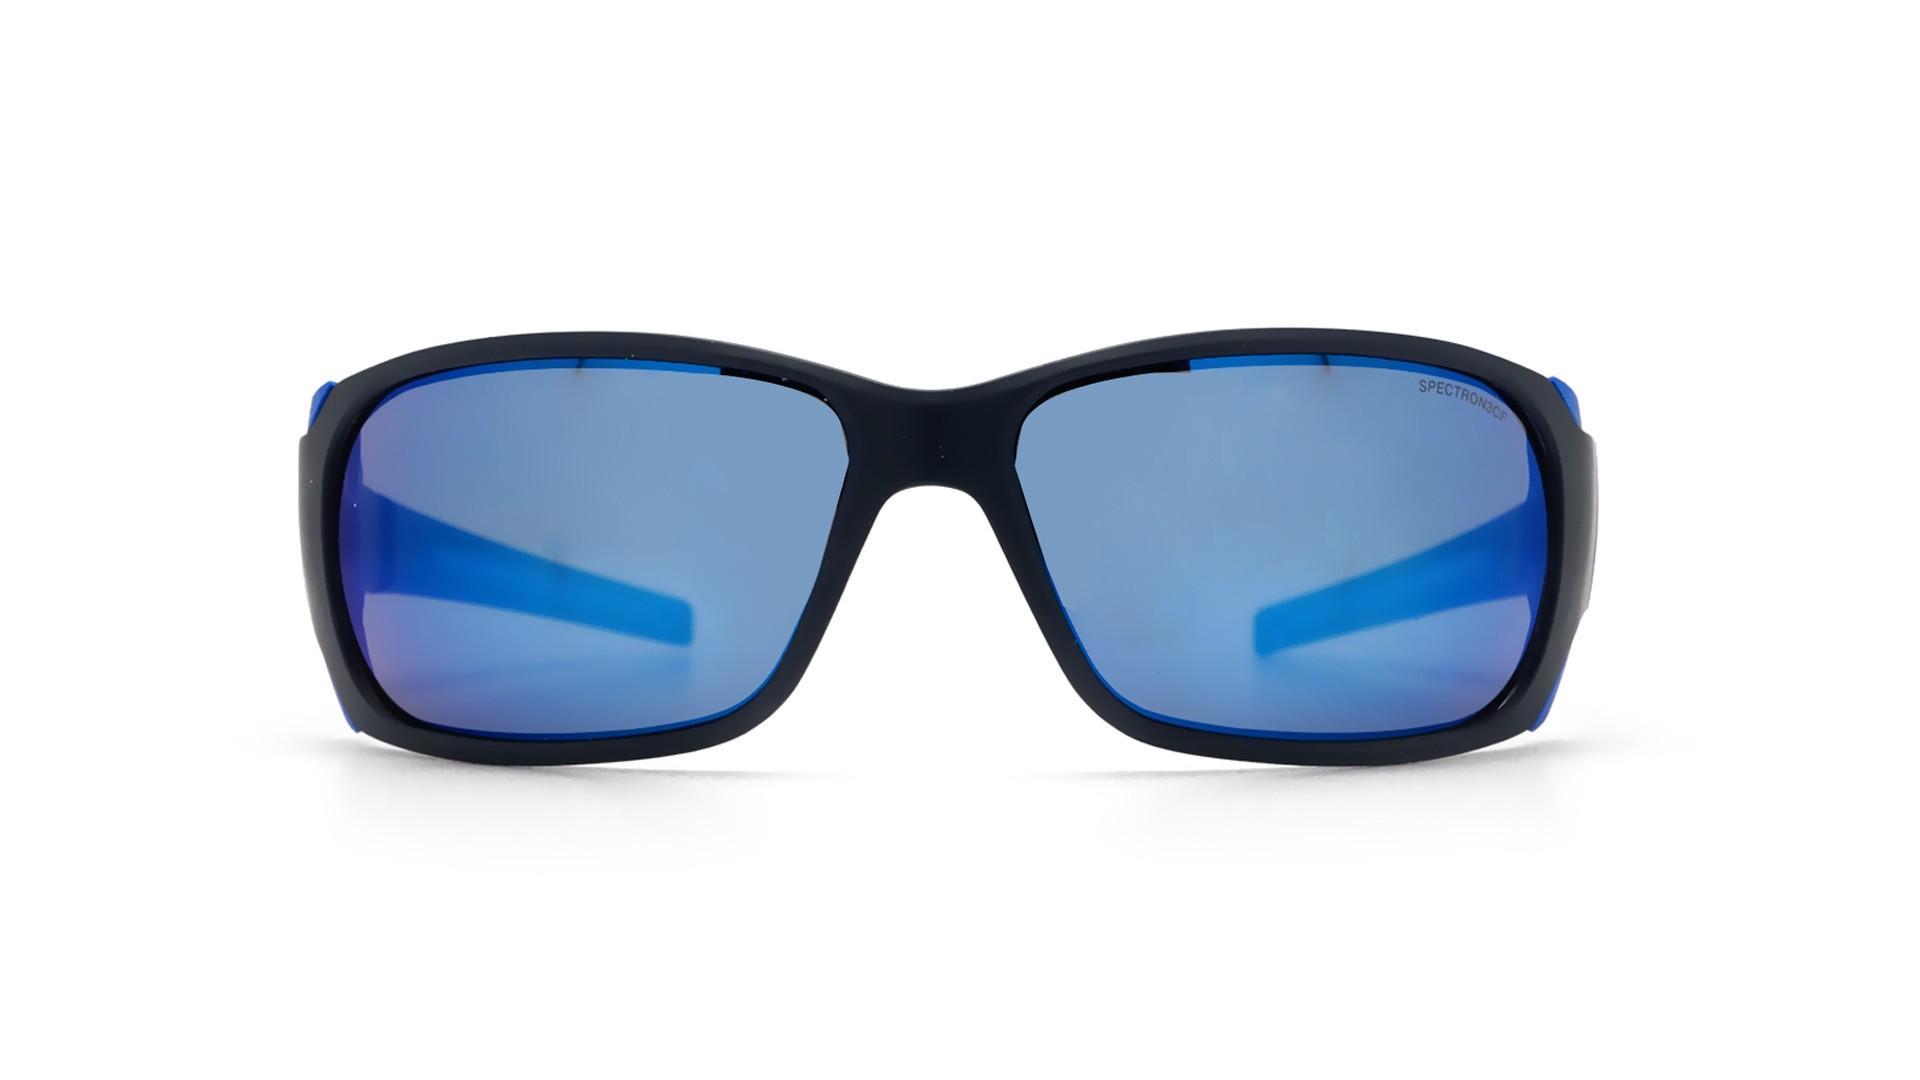 c7be19bbd4faa8 Lunettes de soleil Julbo Montebianco Bleu Mat J415 1112 62-15 Large Miroirs